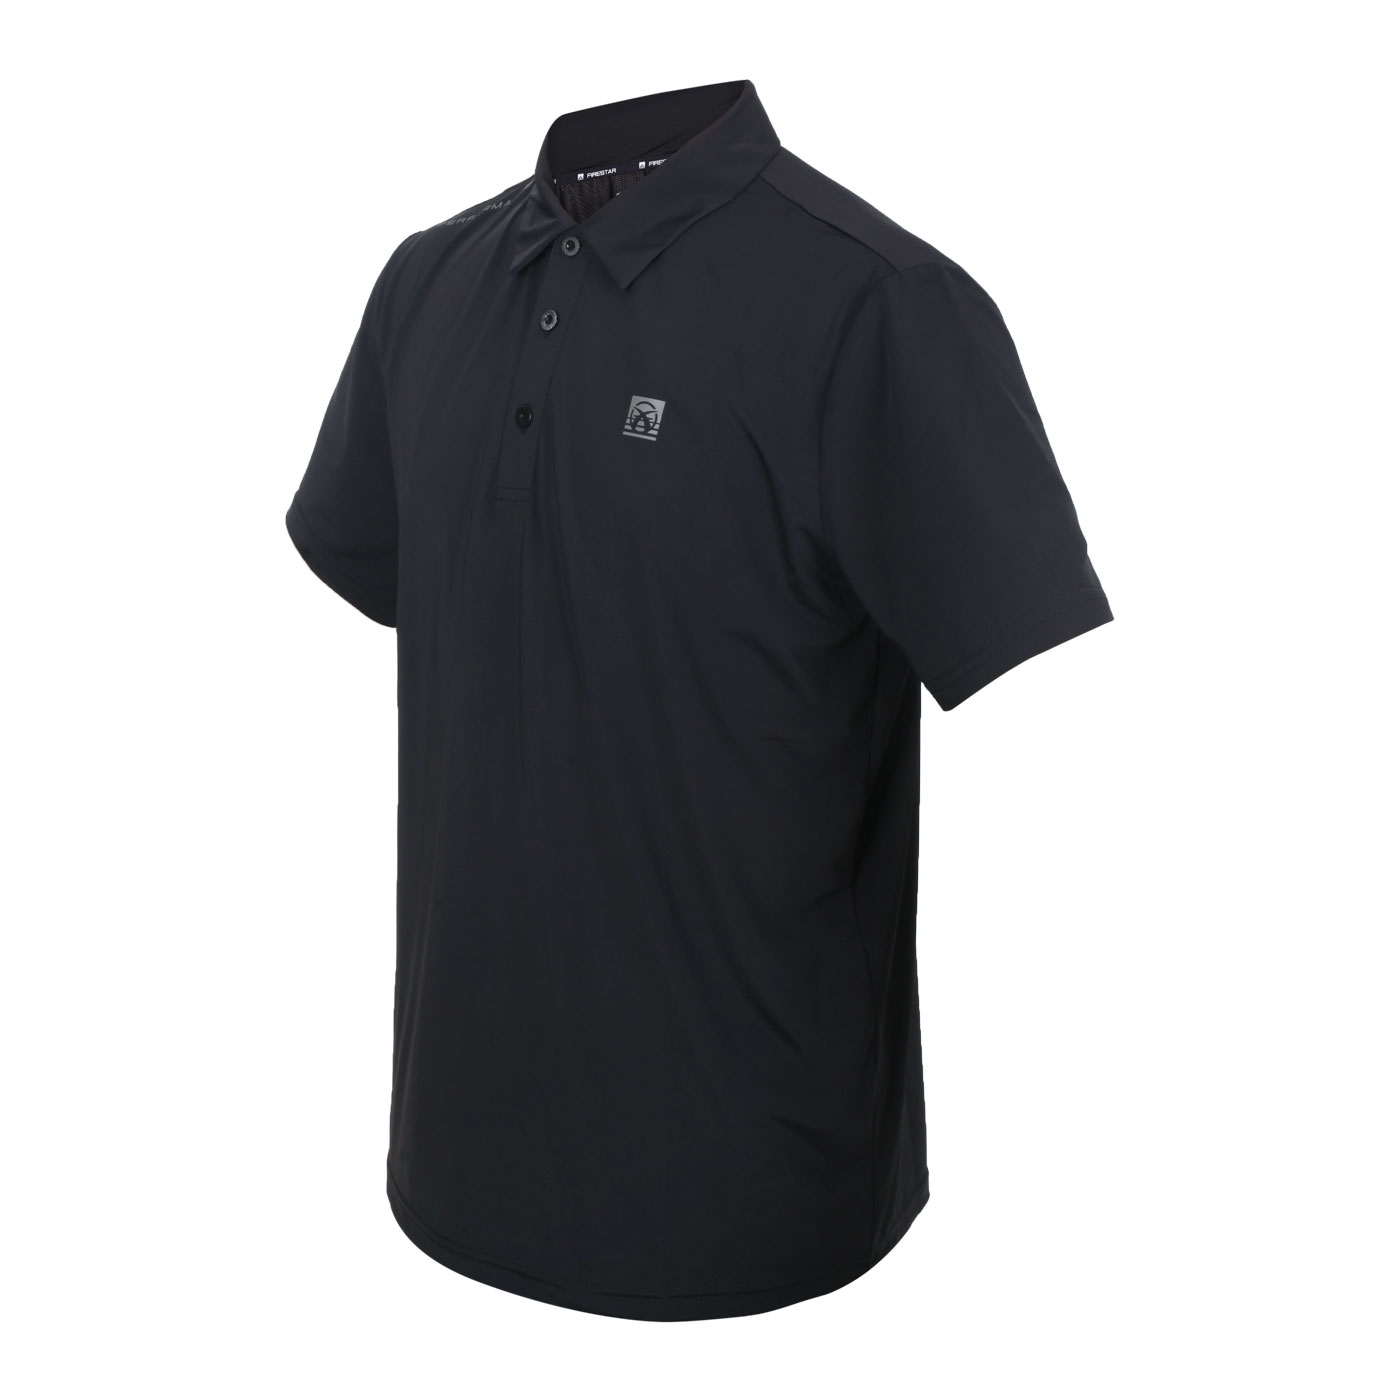 FIRESTAR 男款彈性高爾夫短袖POLO衫 D1752-10